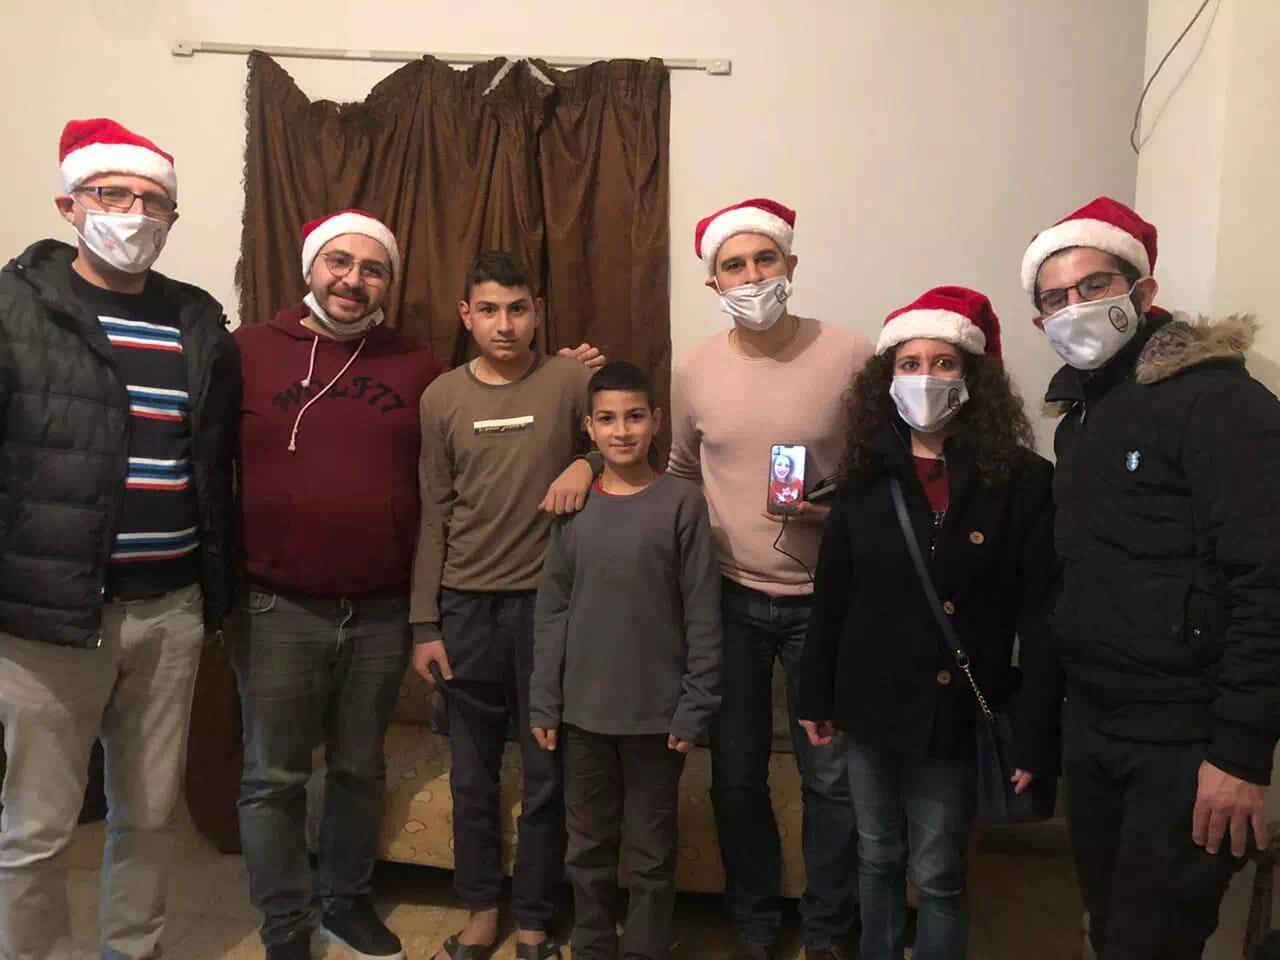 https://eundemia.sirv.com/Images/christmas/456910.webp